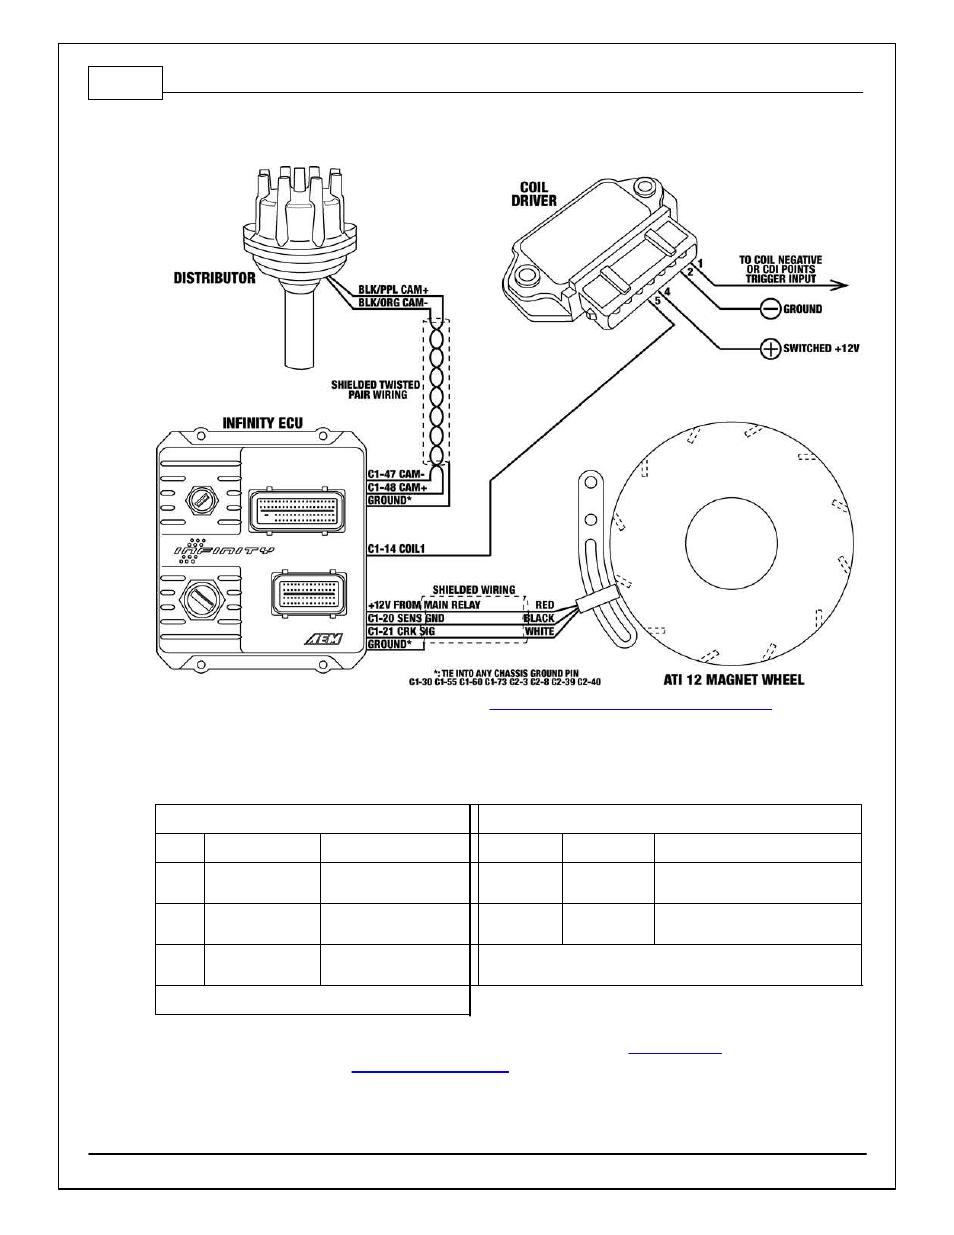 hight resolution of aem infinity supported applications universal v8 engine user rh manualsdir com